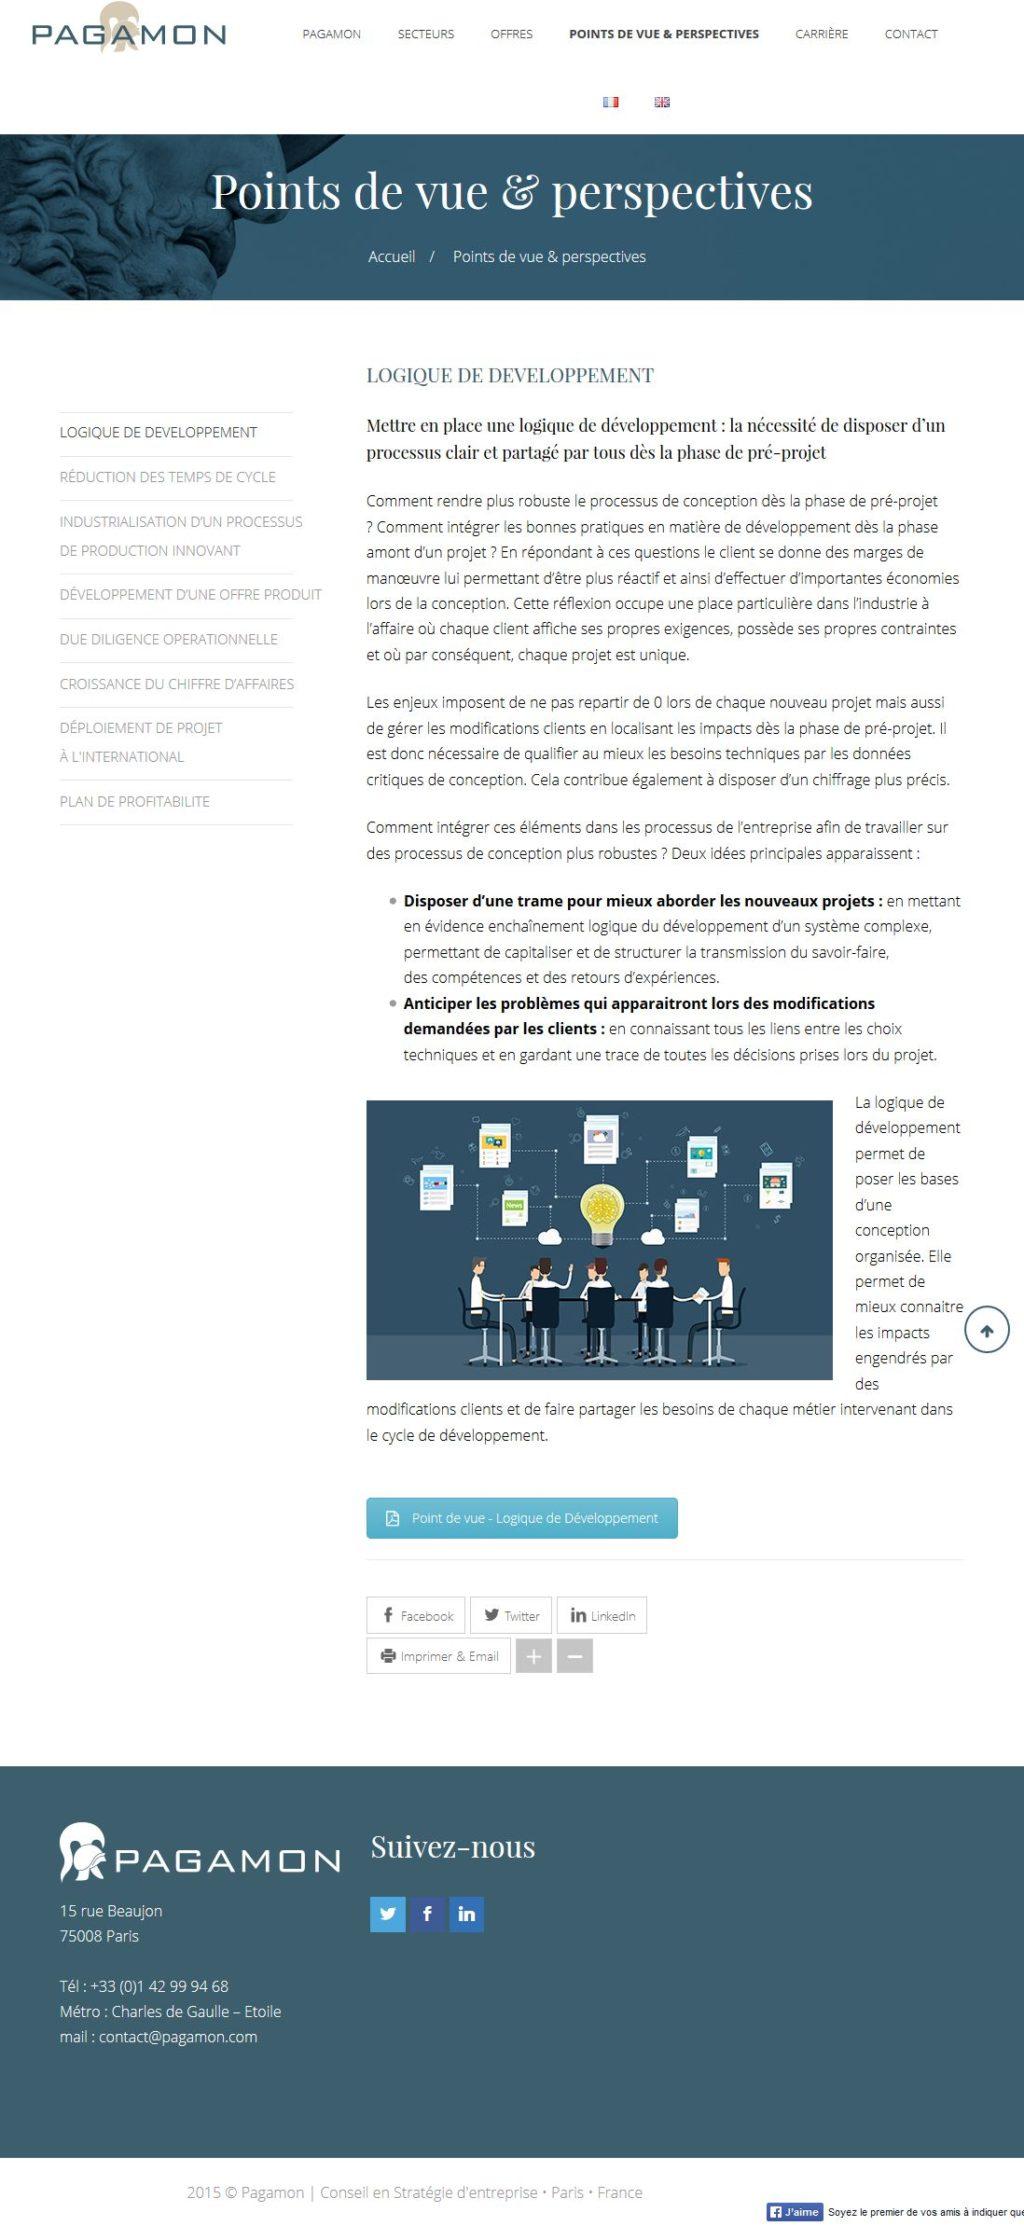 pagamon adstriver agence de communication print digitale